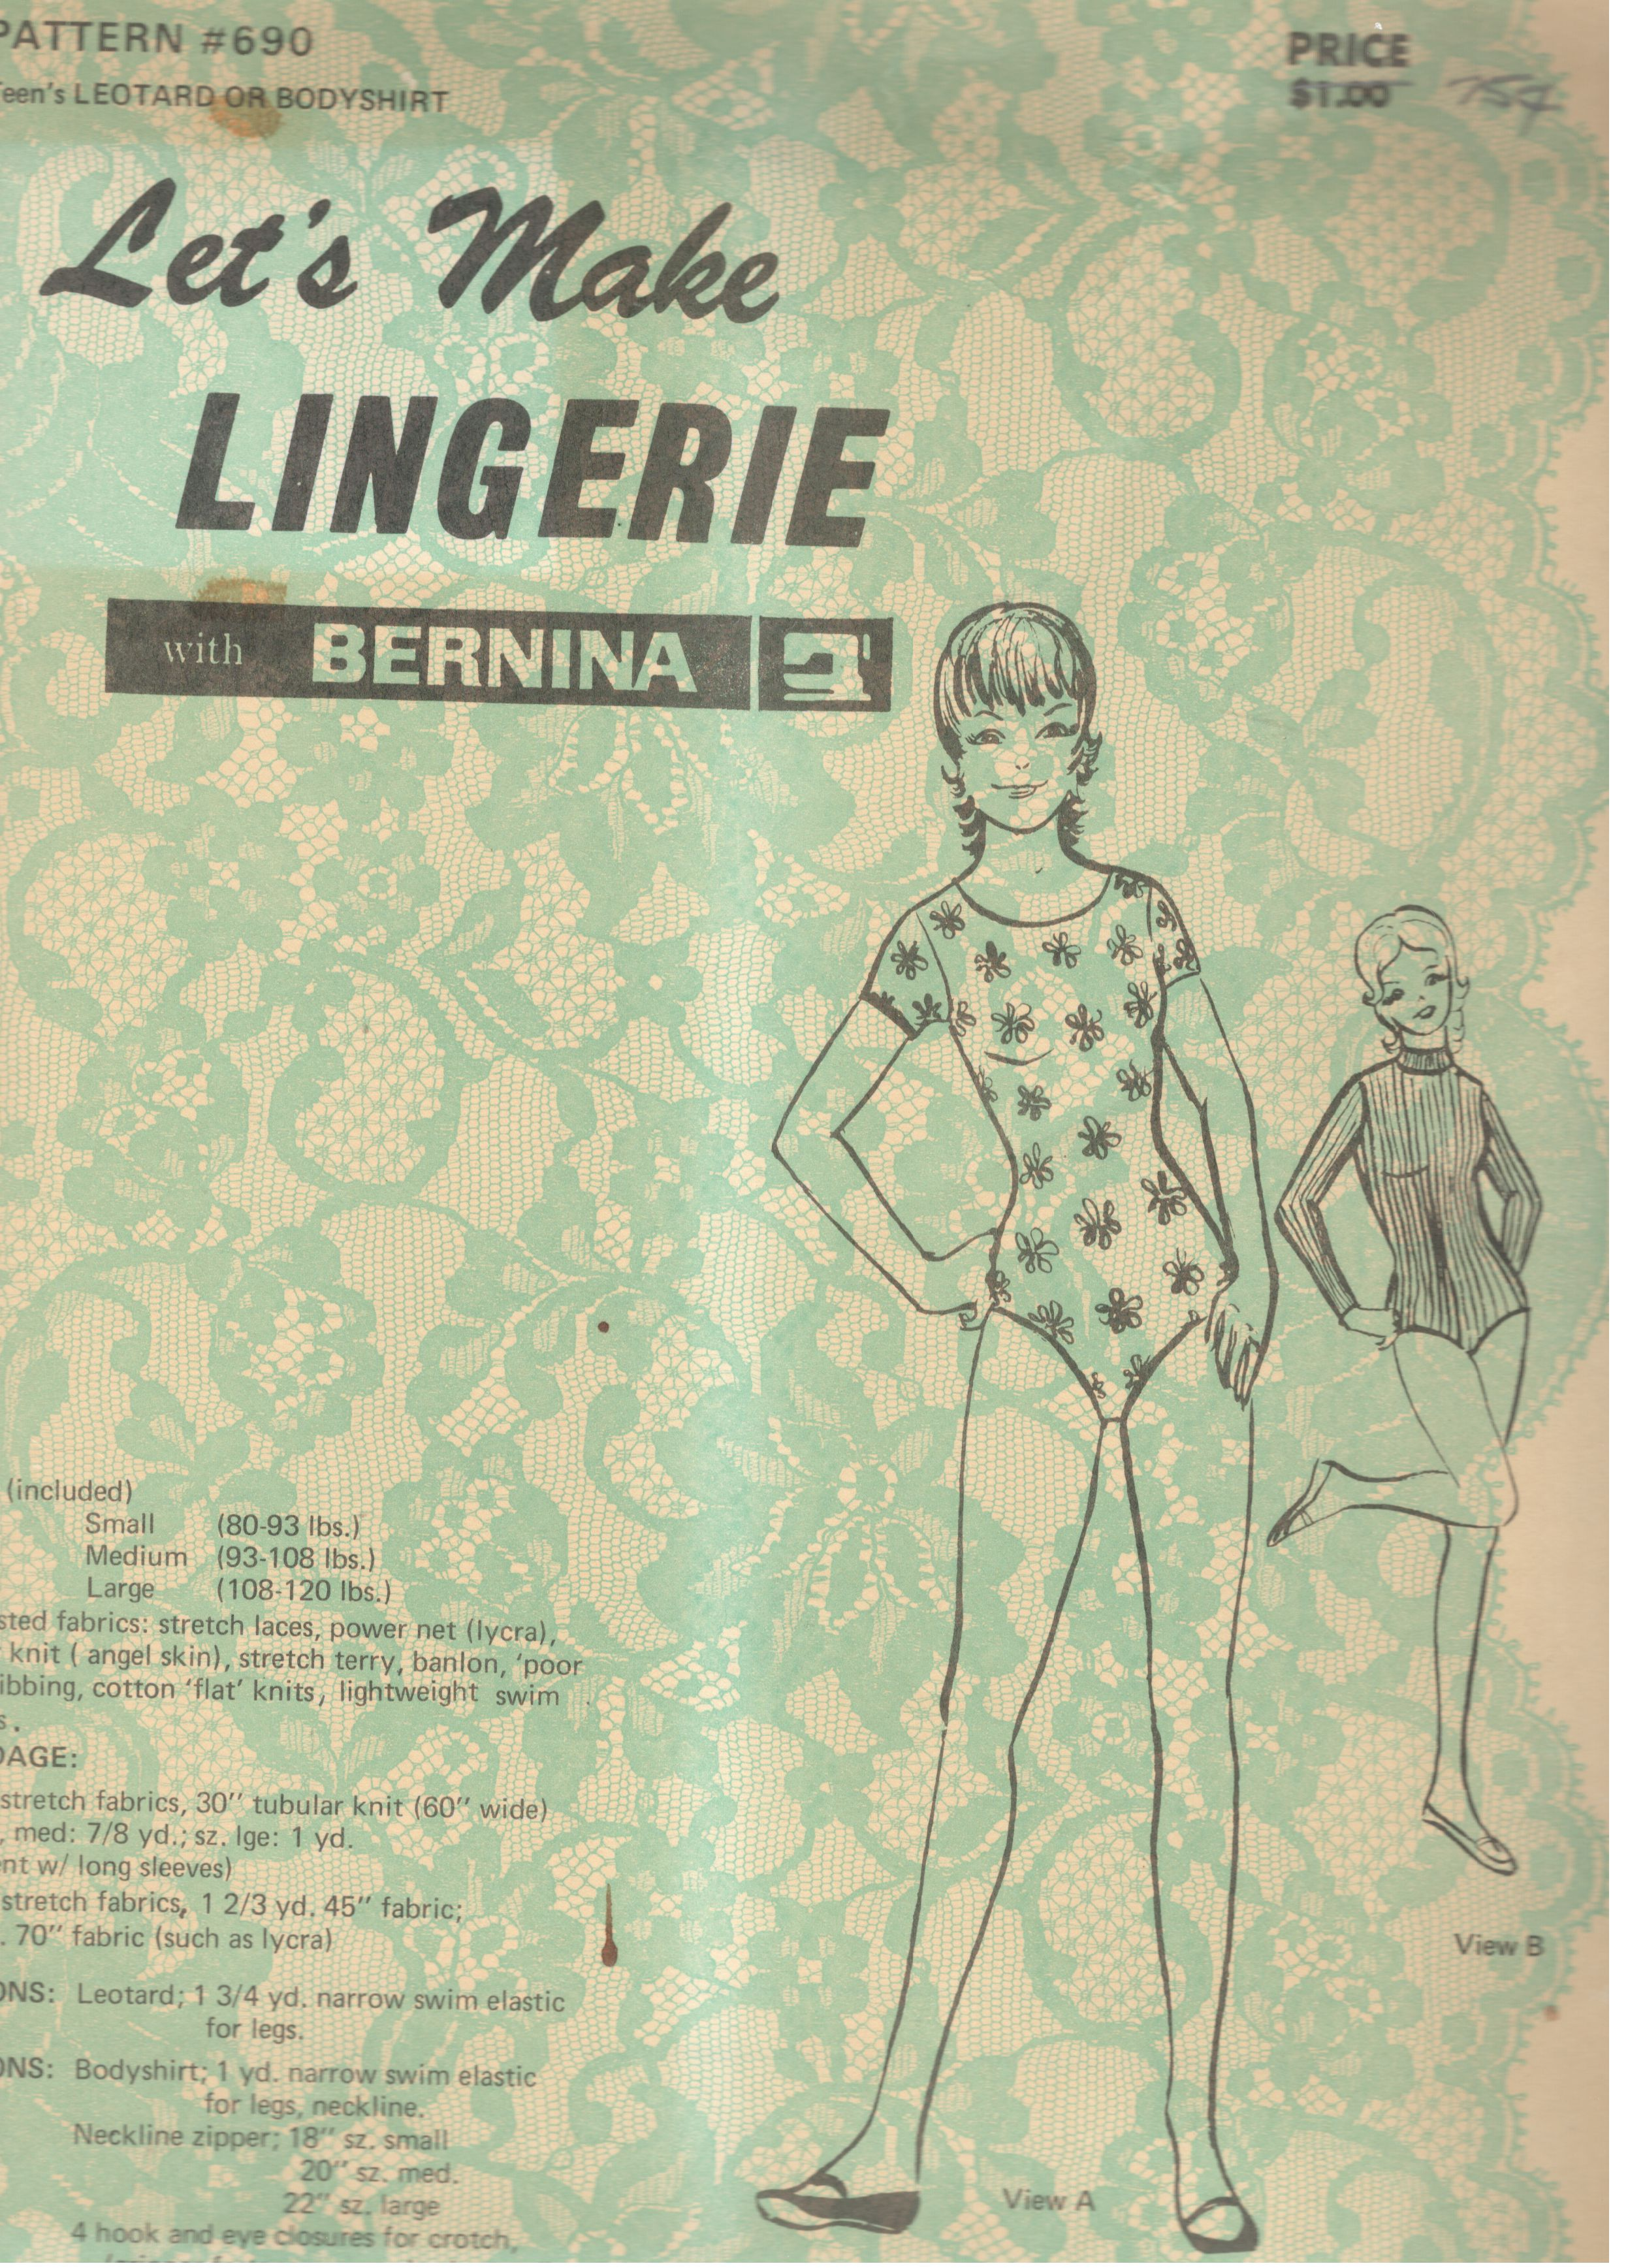 Let's Make Lingerie 690